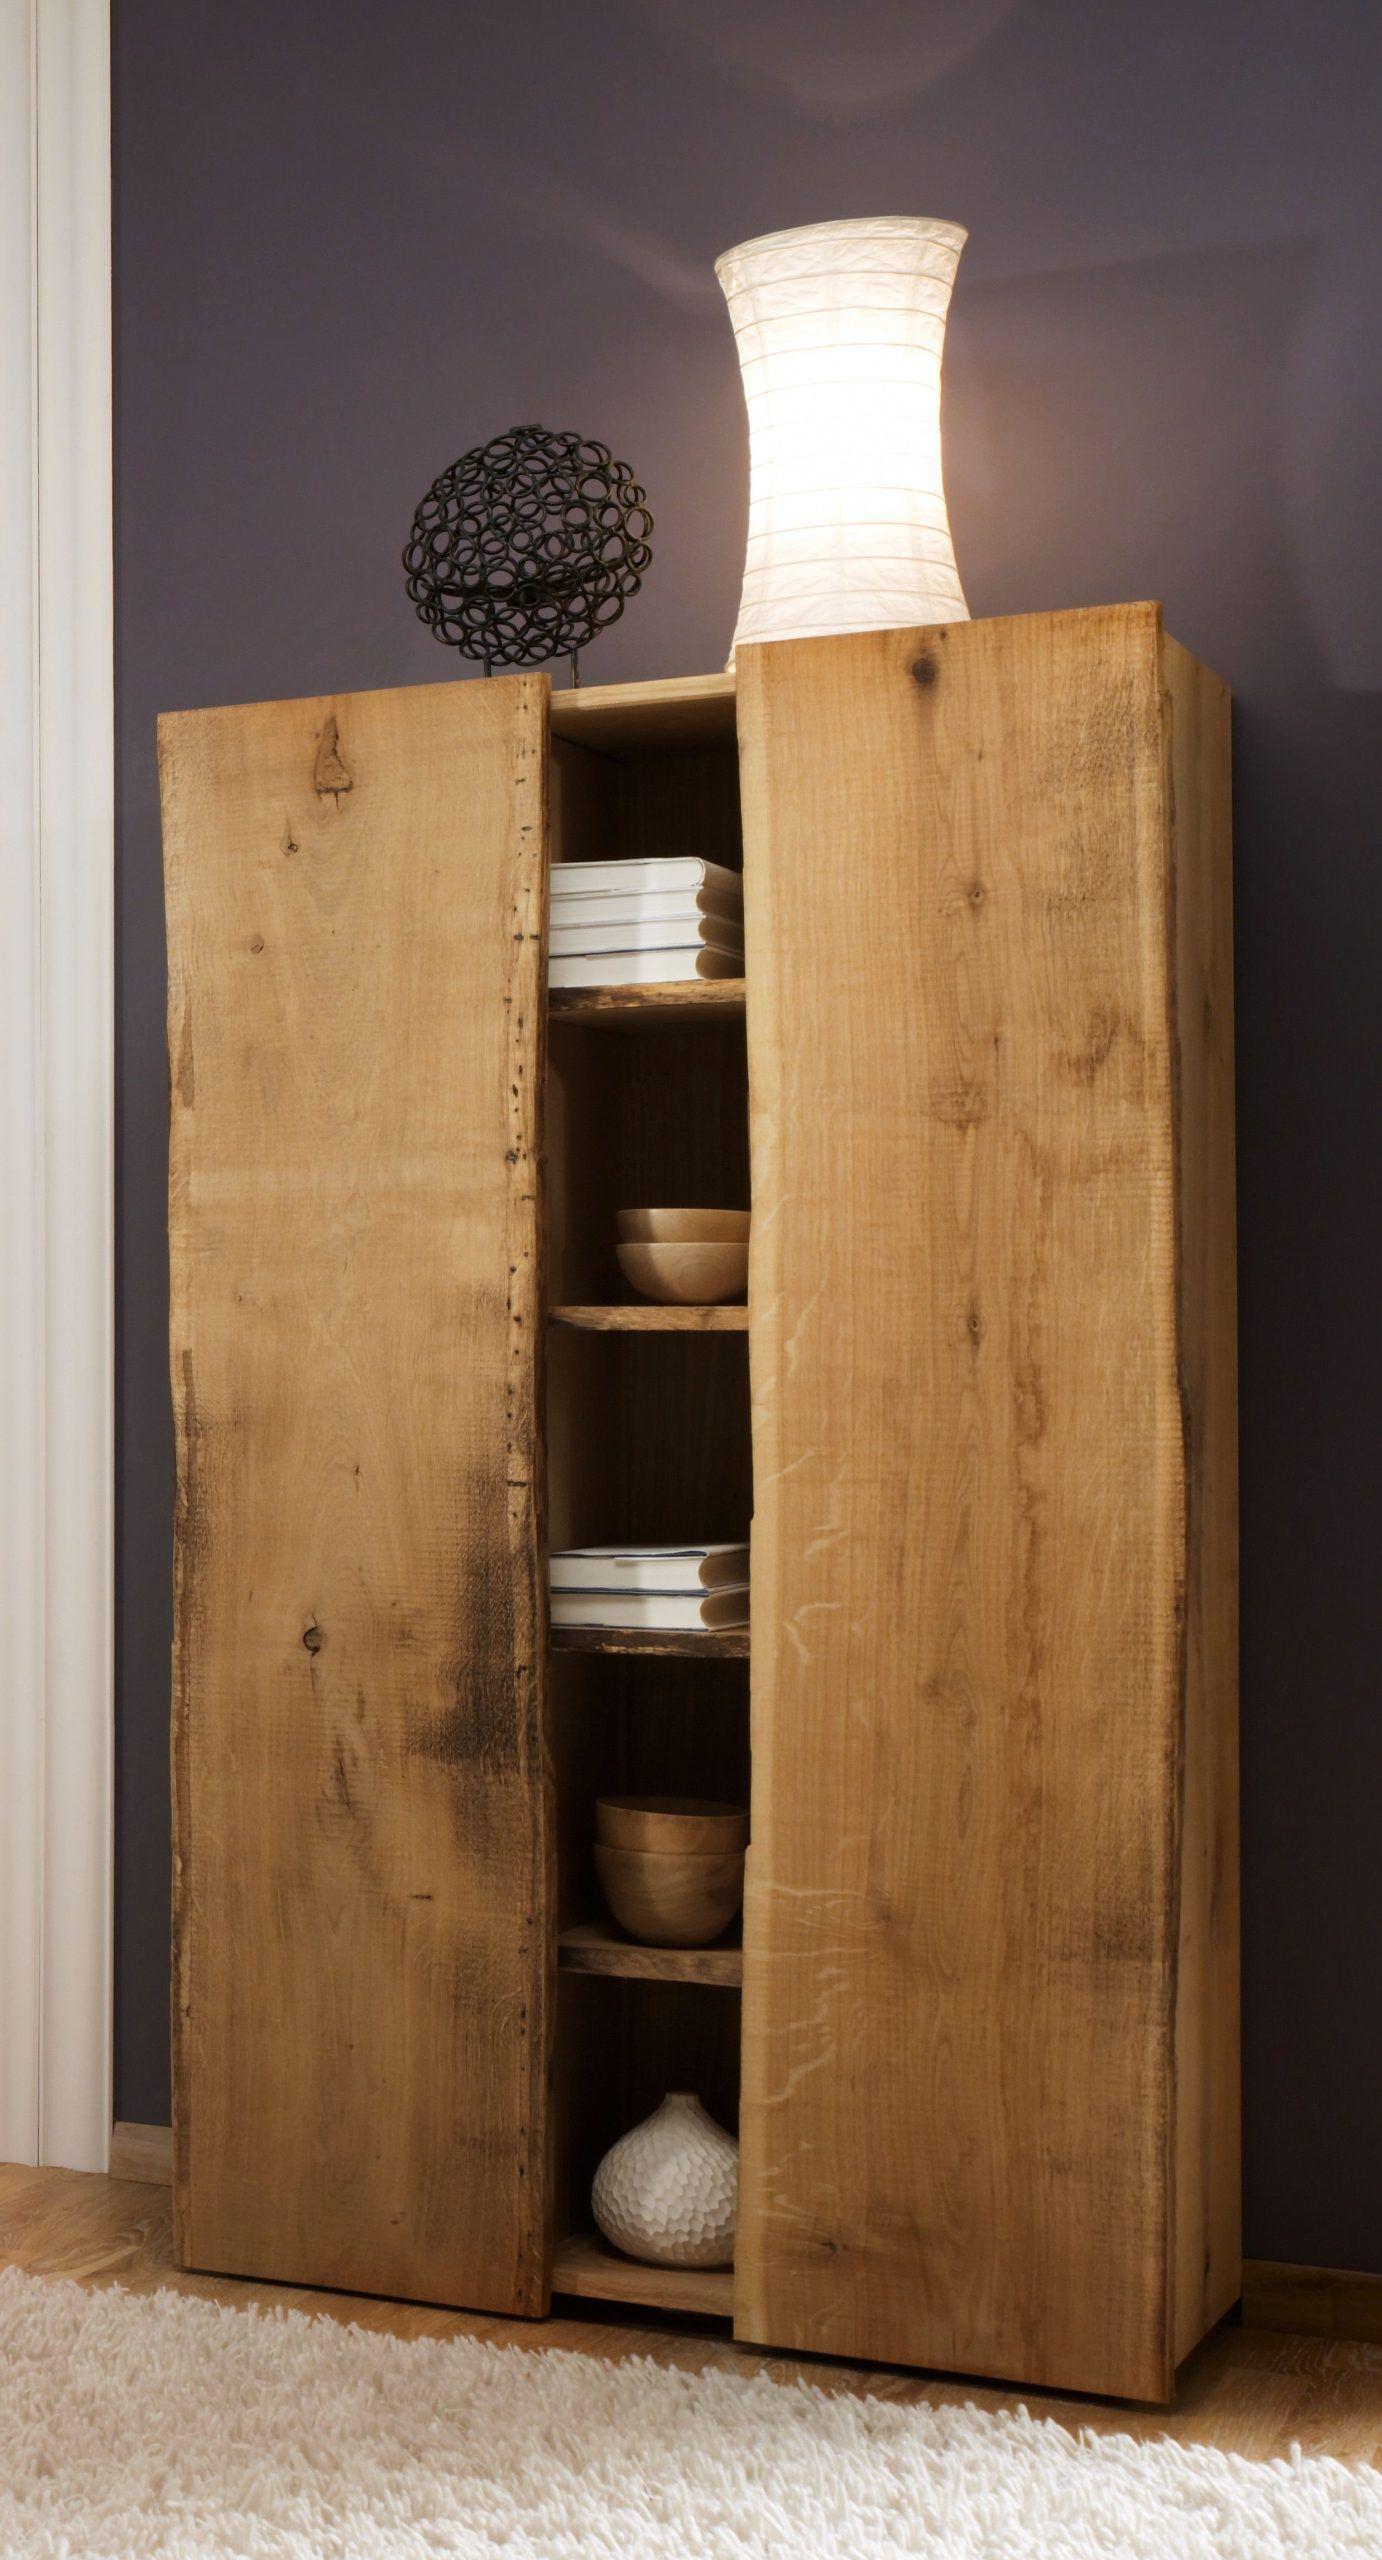 Highboard Solid Wood Oak 1 German Decor 2019 Home